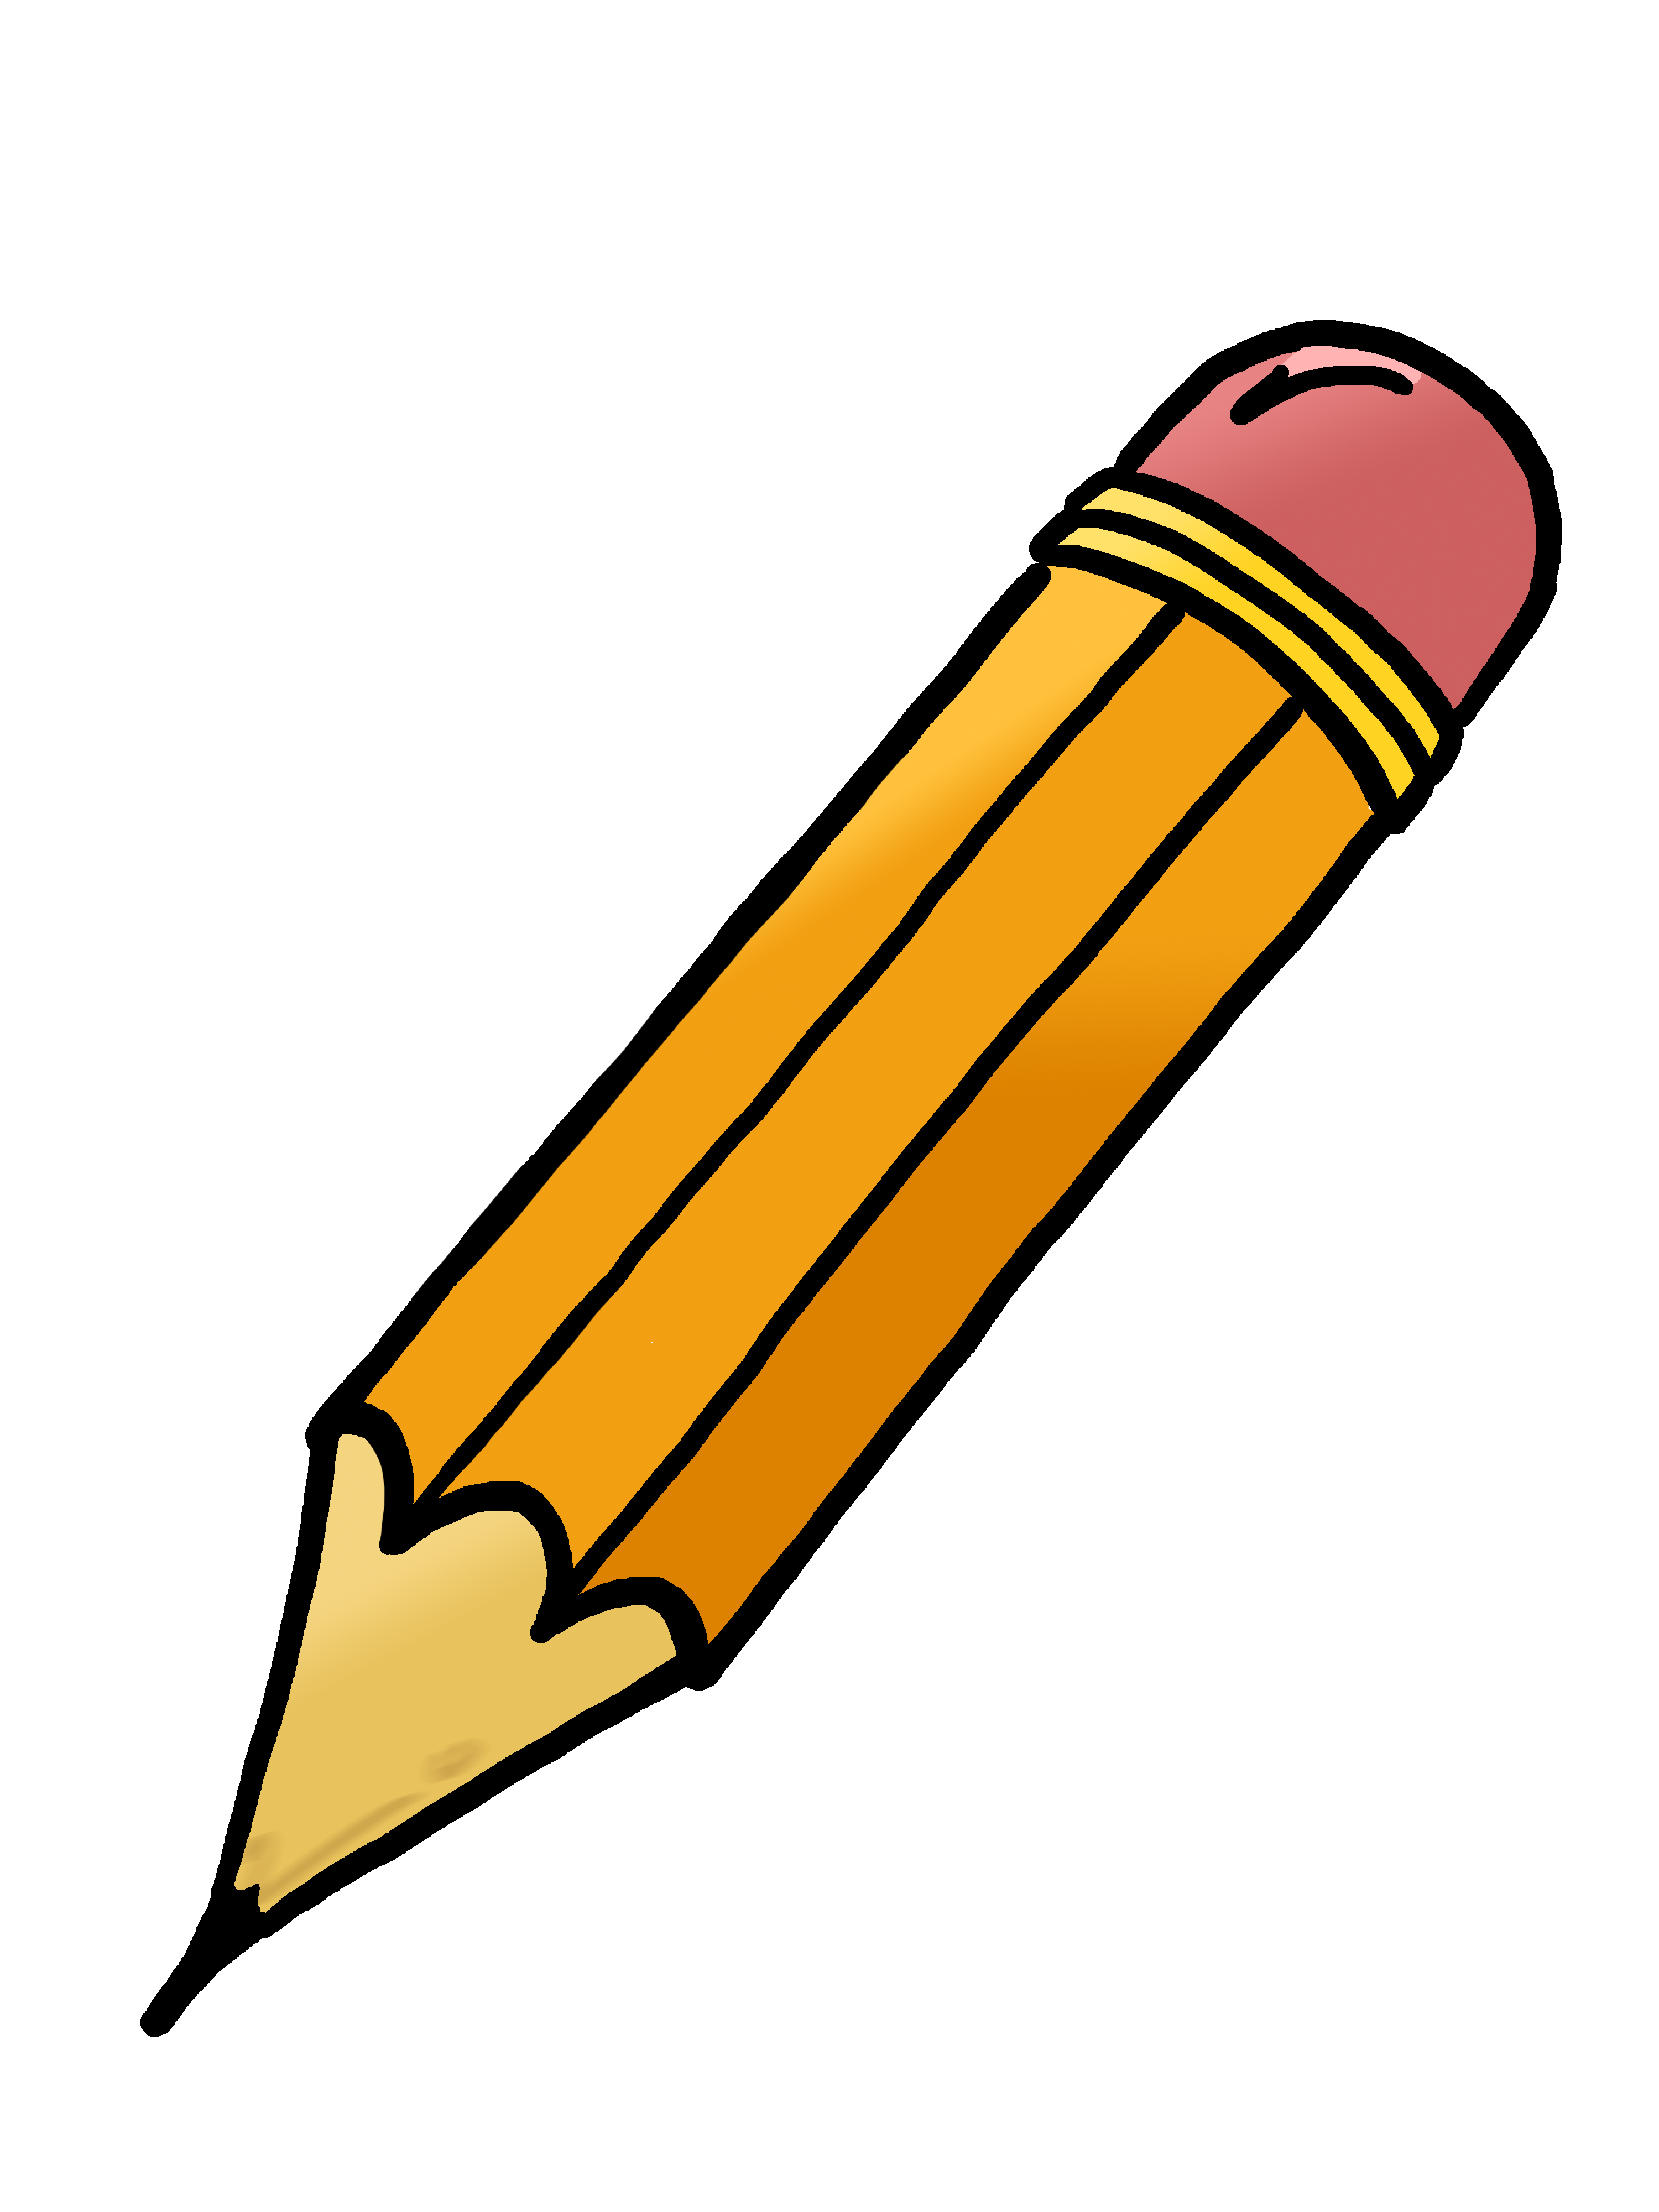 Poetry clipart fountain pen. Pencil